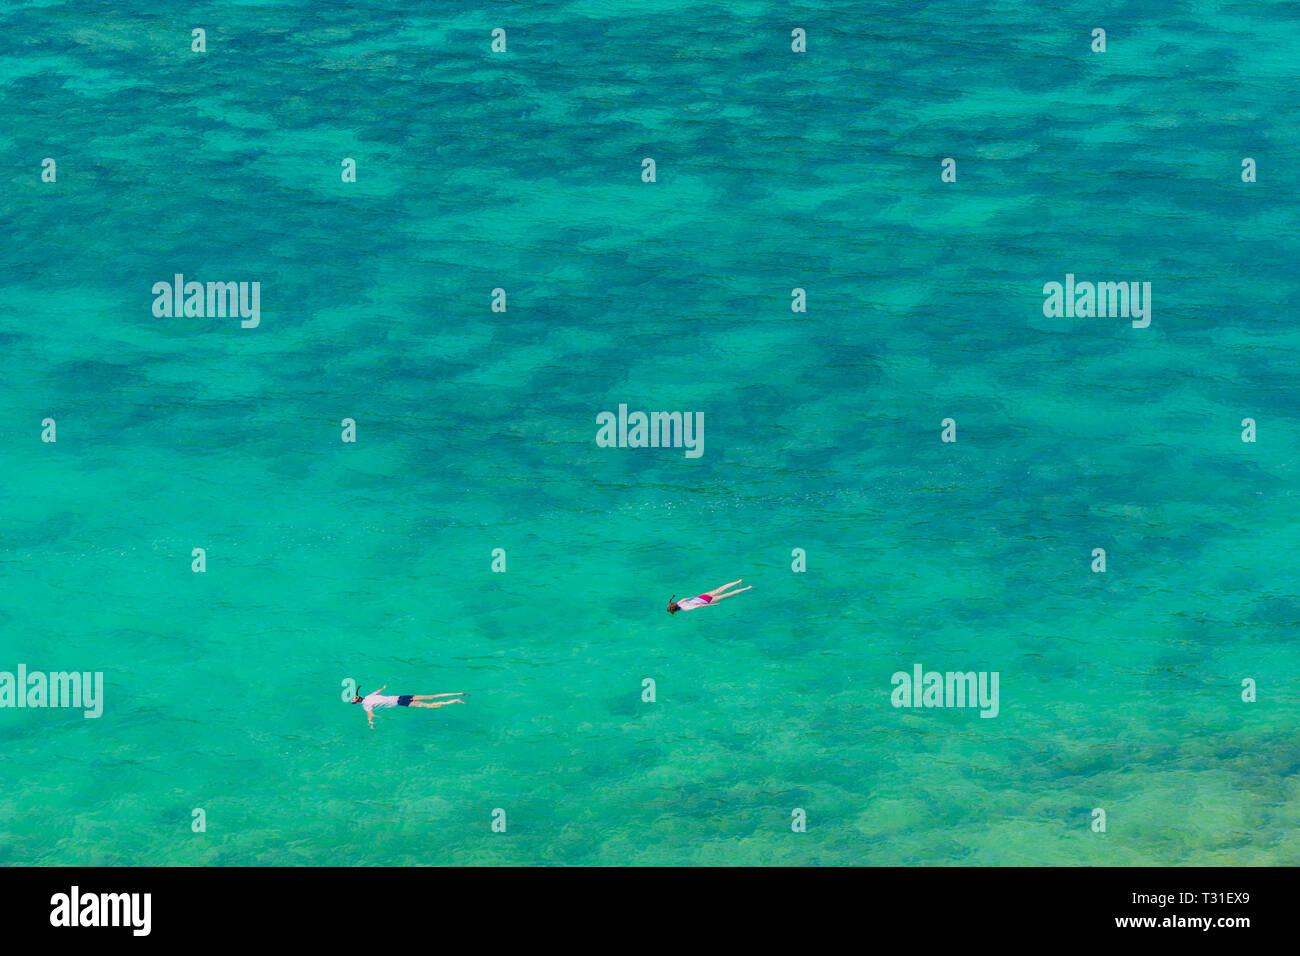 February 2019. Ko Lipe Thailand. A view of snorkling in Ko Lipe in Ko tarutao national park in Thailand Stock Photo